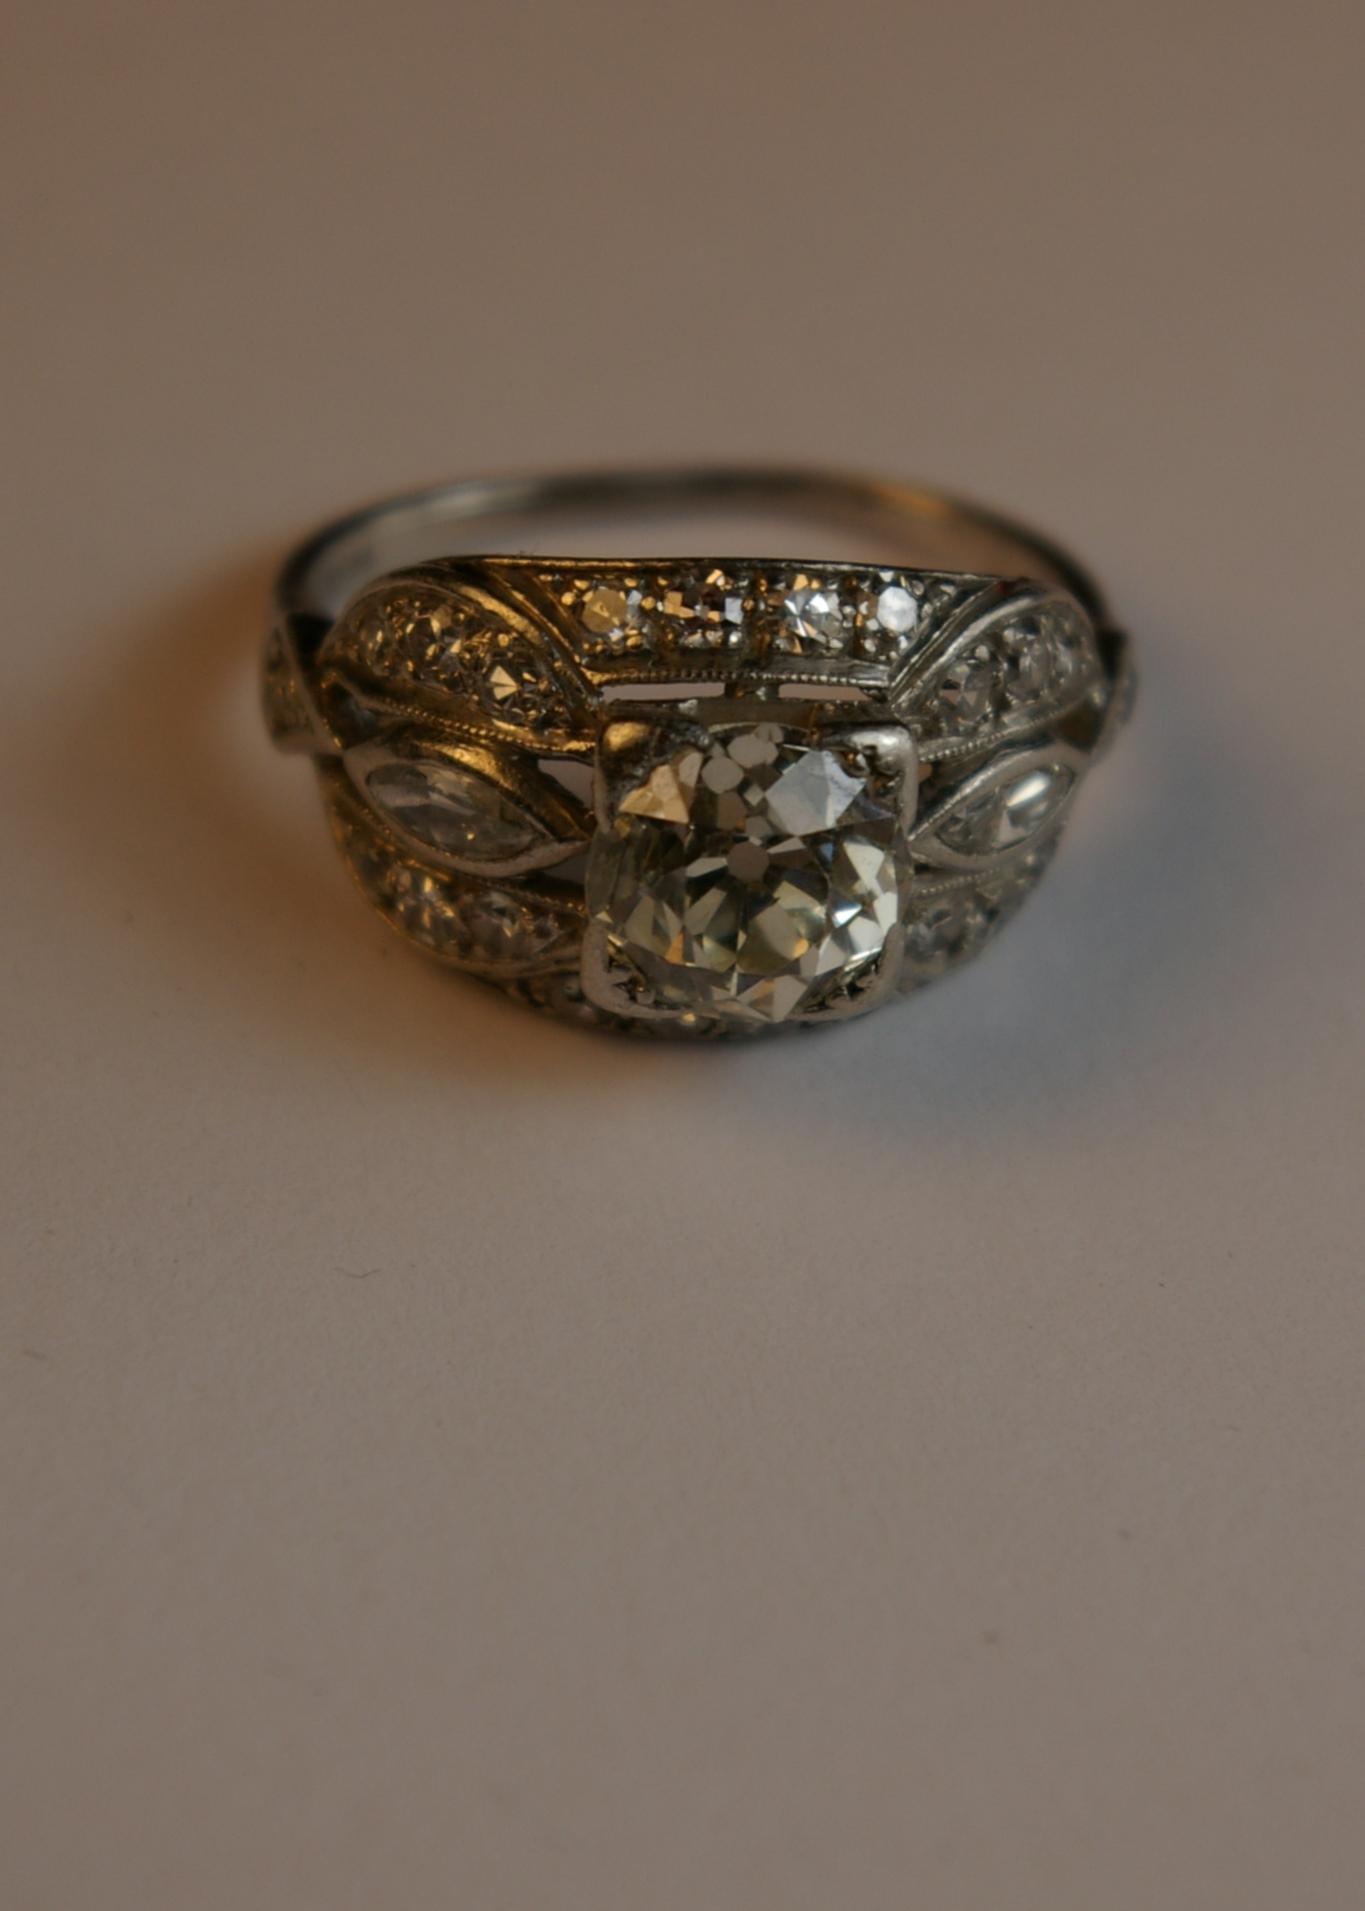 Damaged ring before restoration